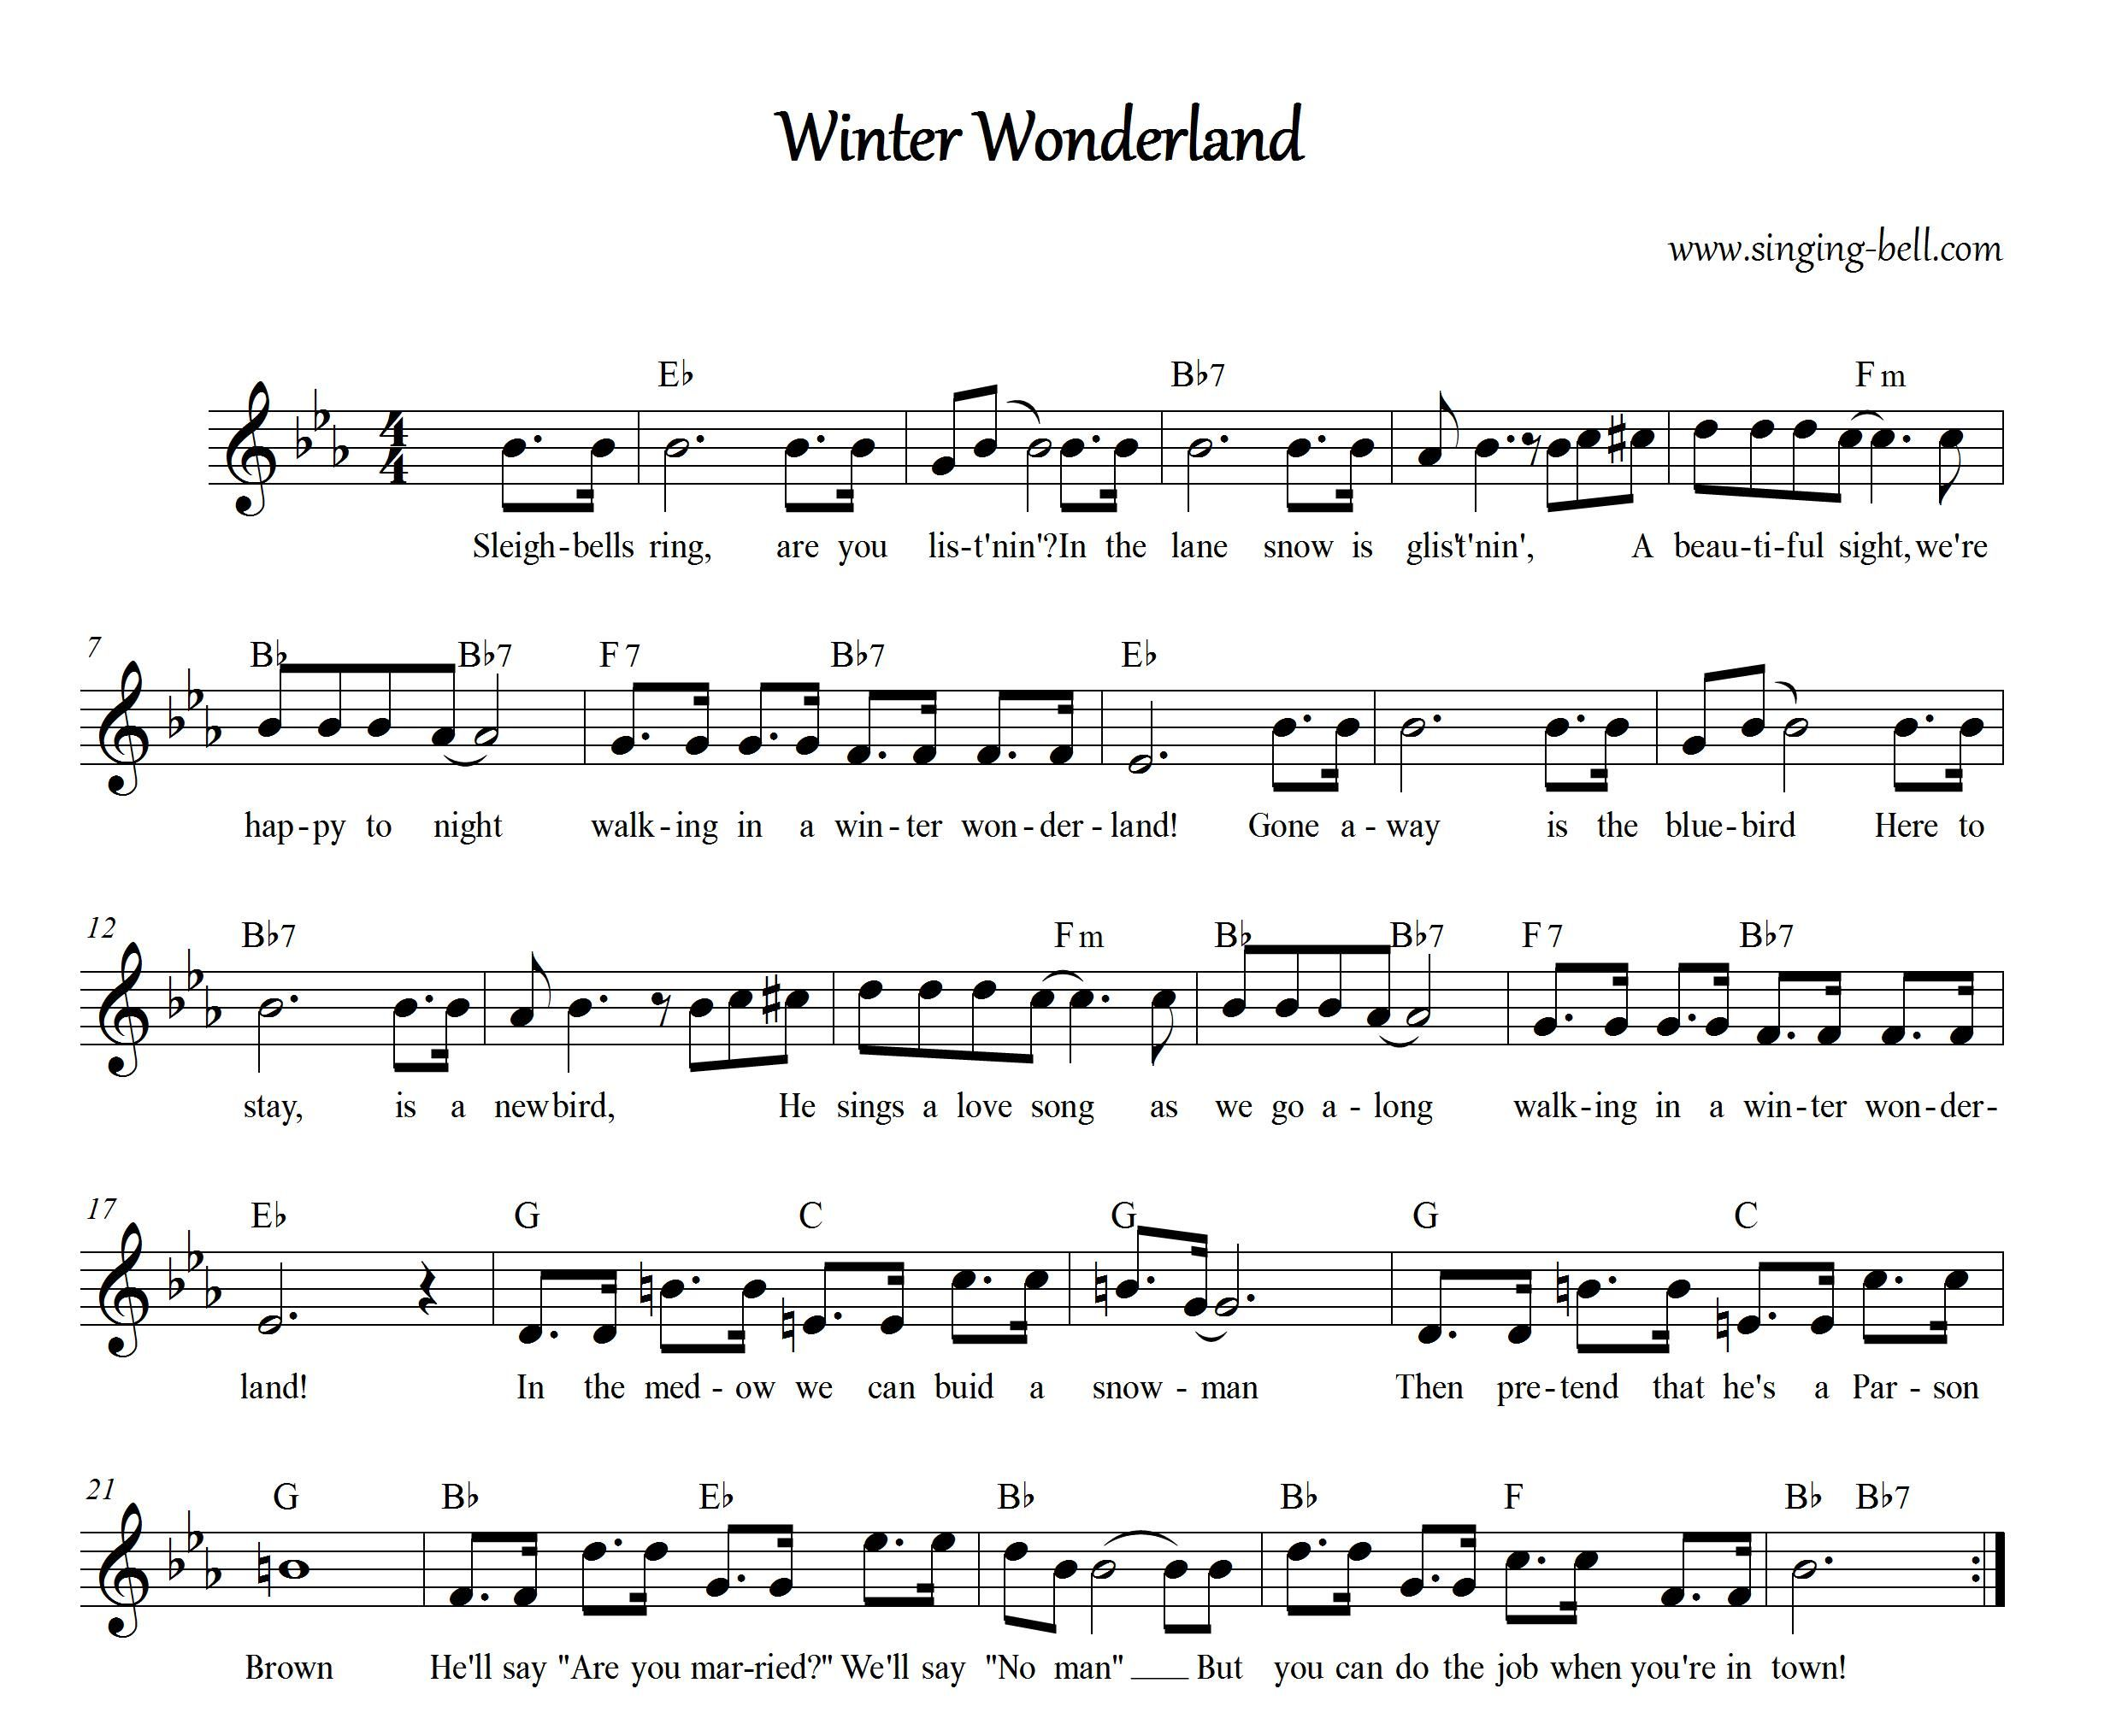 Winter Wonderland Winter wonderland, Christmas sheet